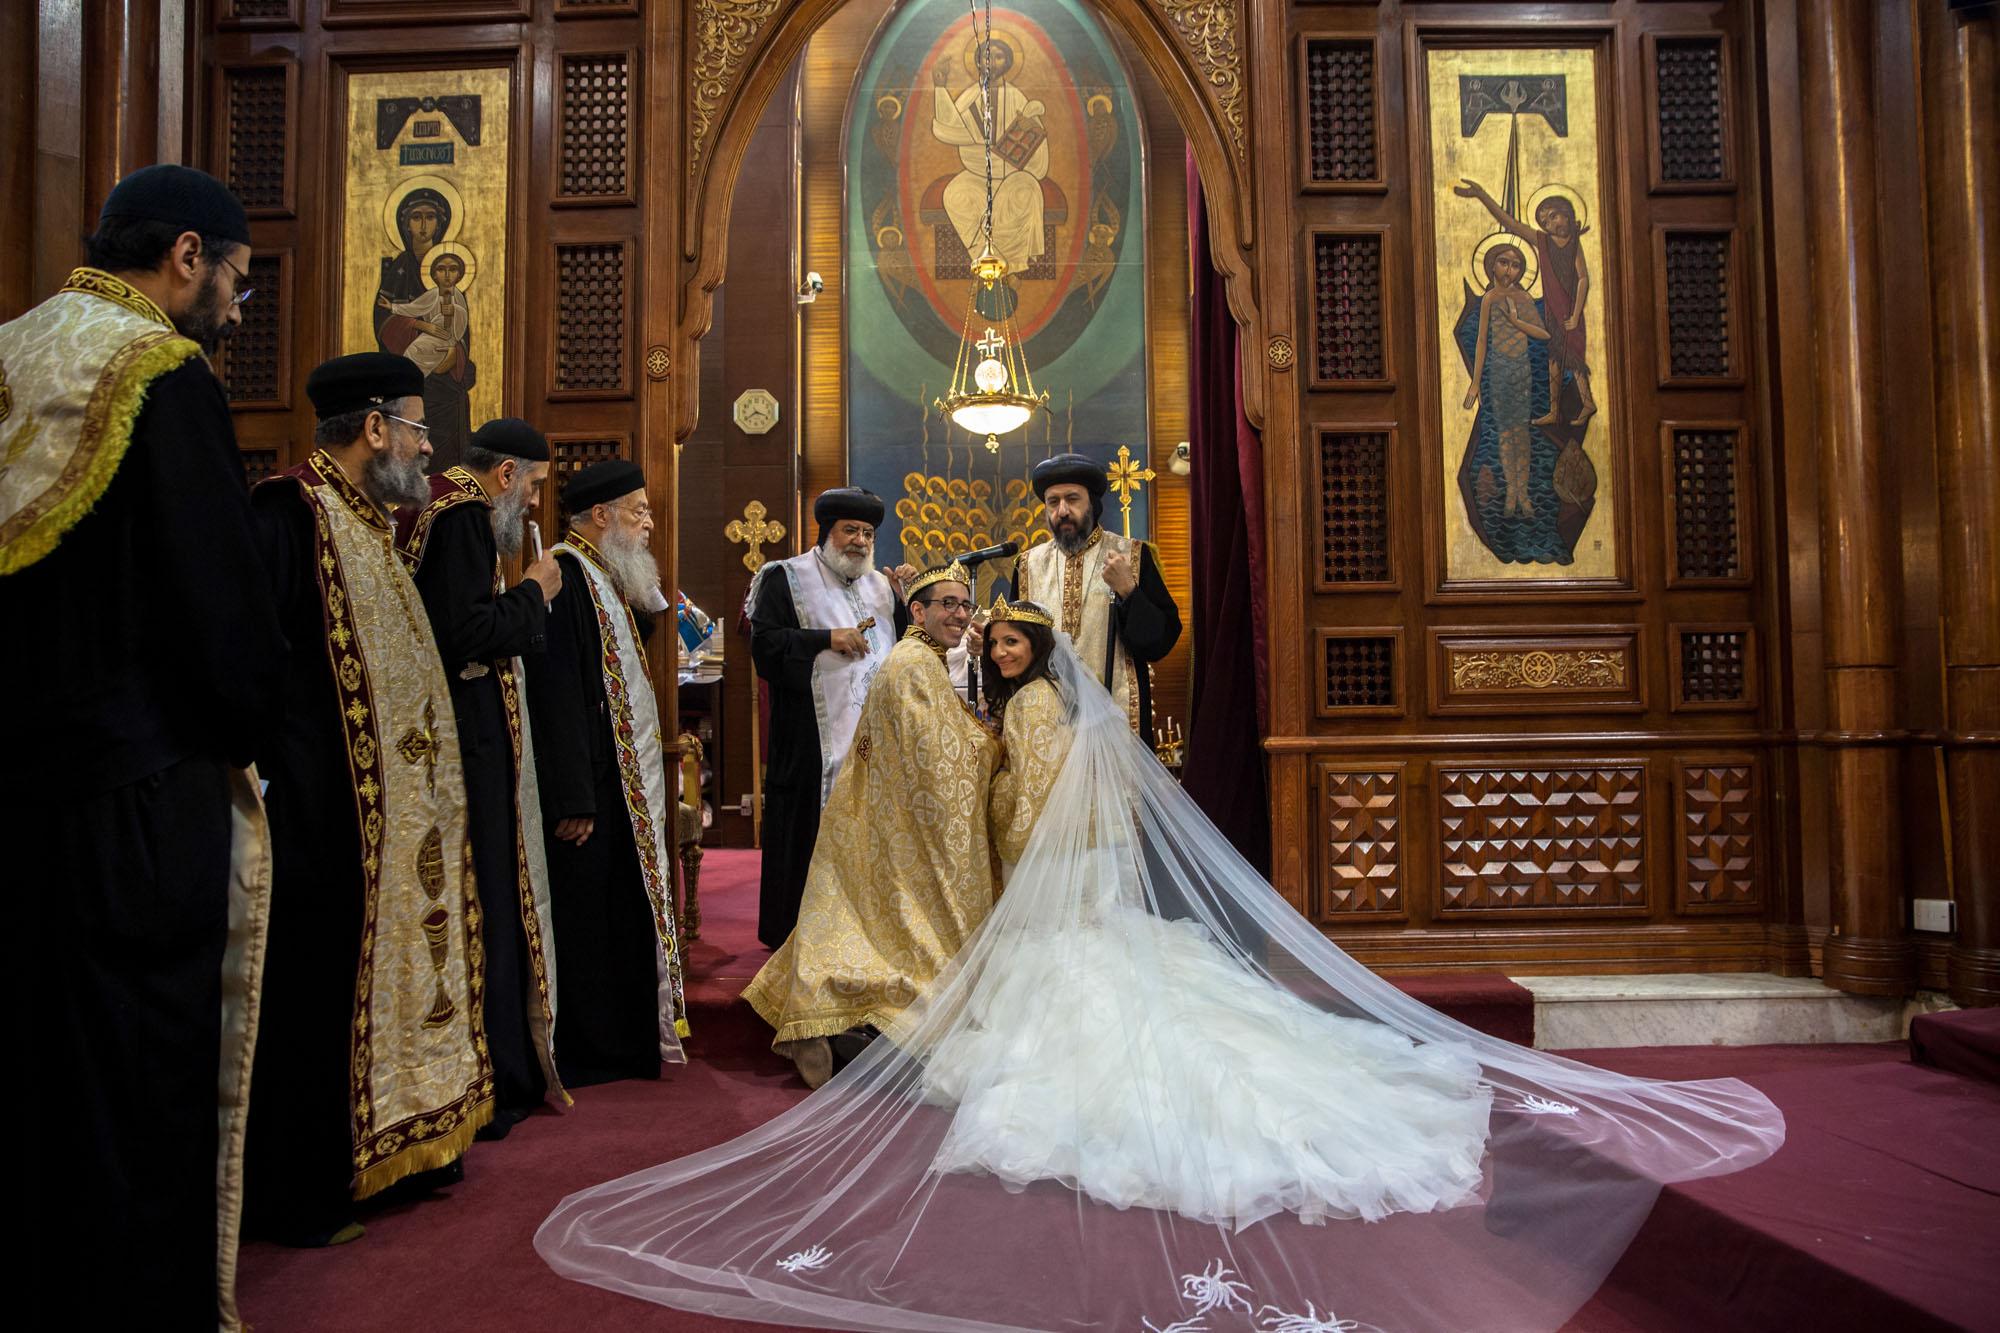 weddings-couples-love-photographer-oxford-london-jonathan-self-photography-37.jpg